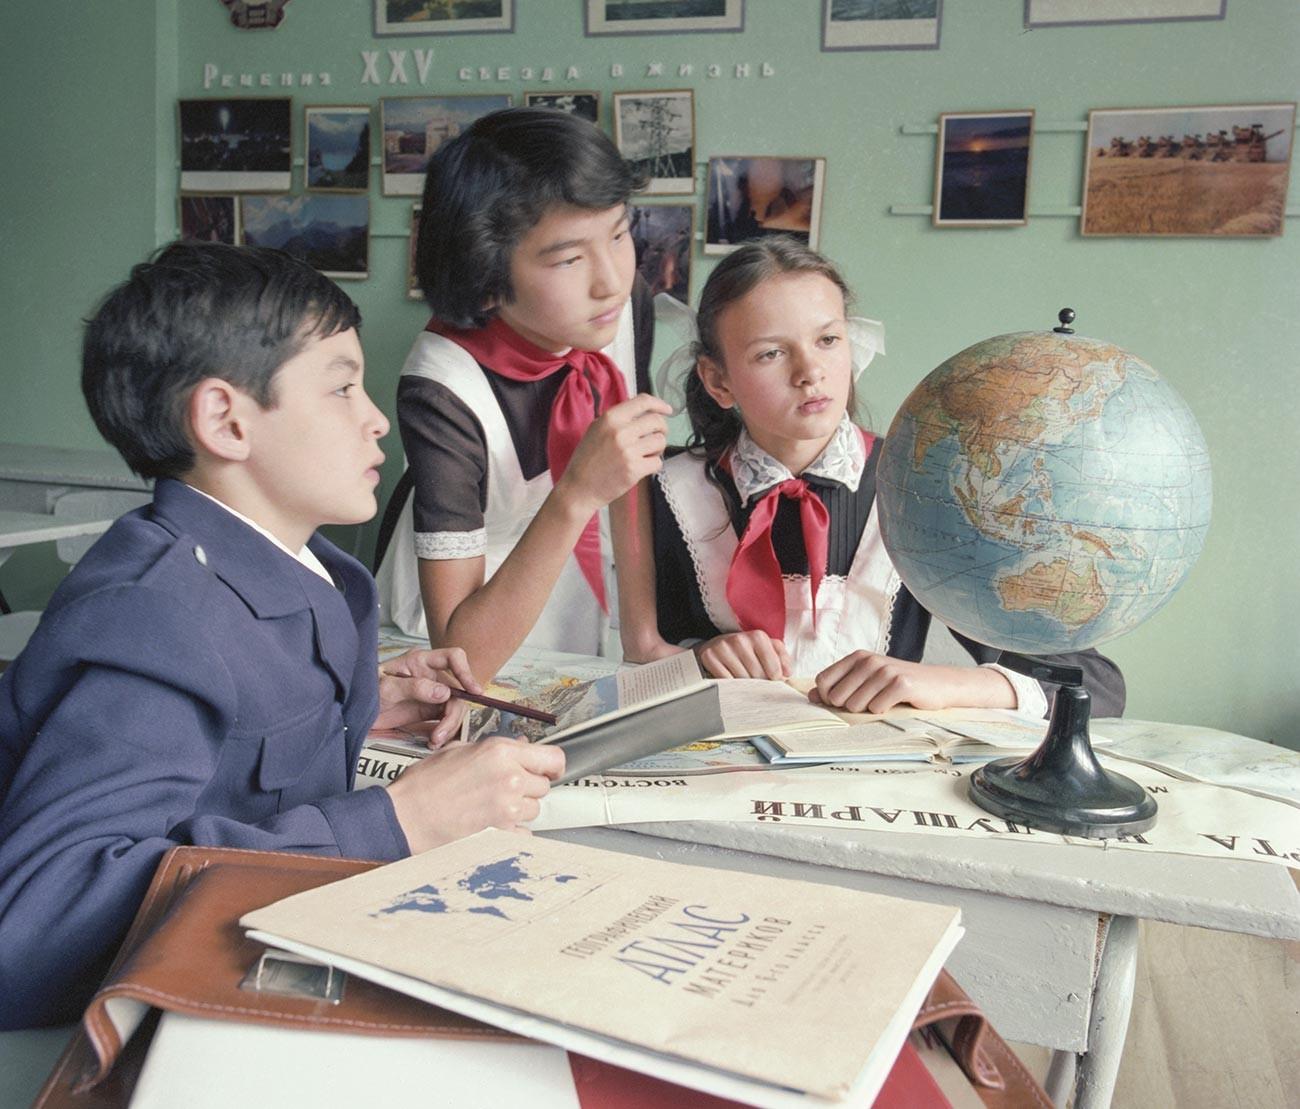 Schoolchildren in Almaty, Kazakh SSR